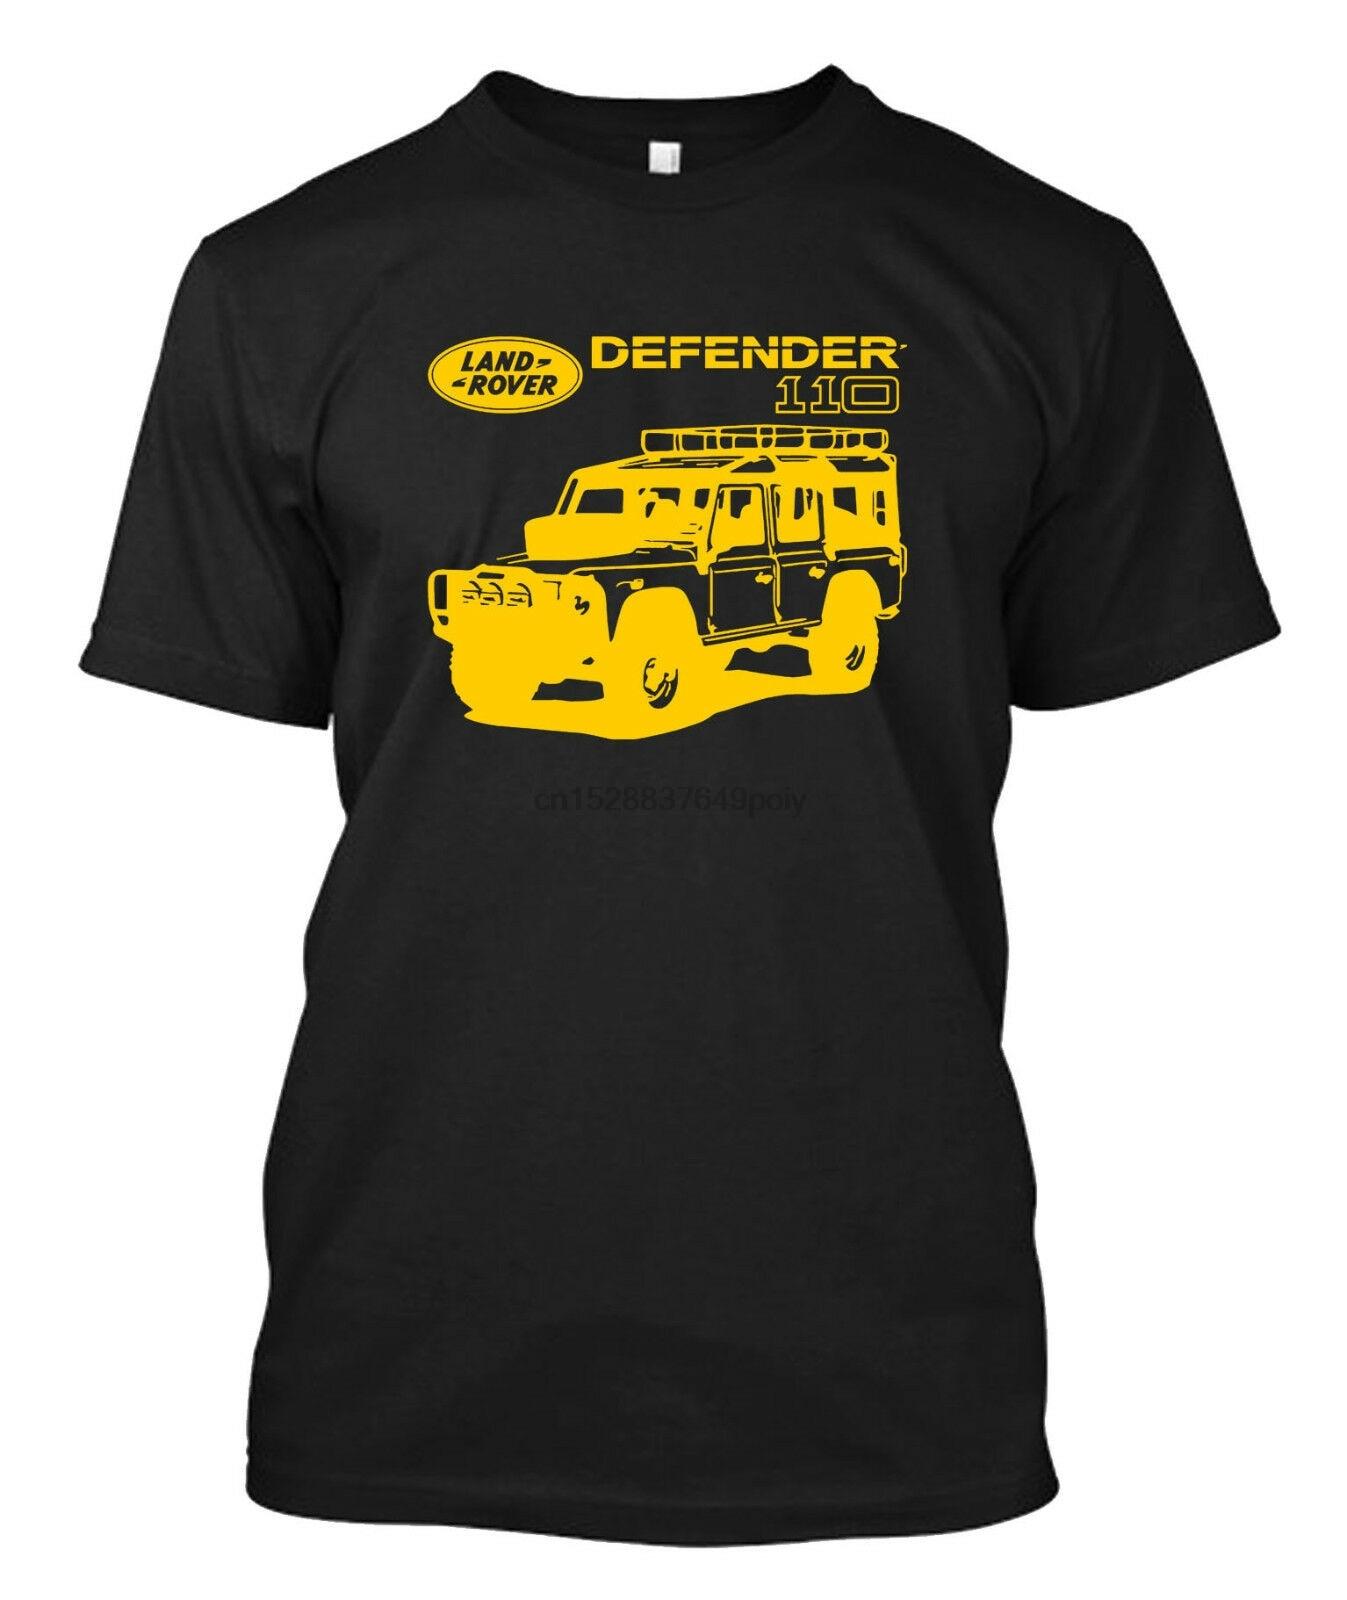 Camiseta Defender 110 Land para hombre Rover-camiseta personalizada